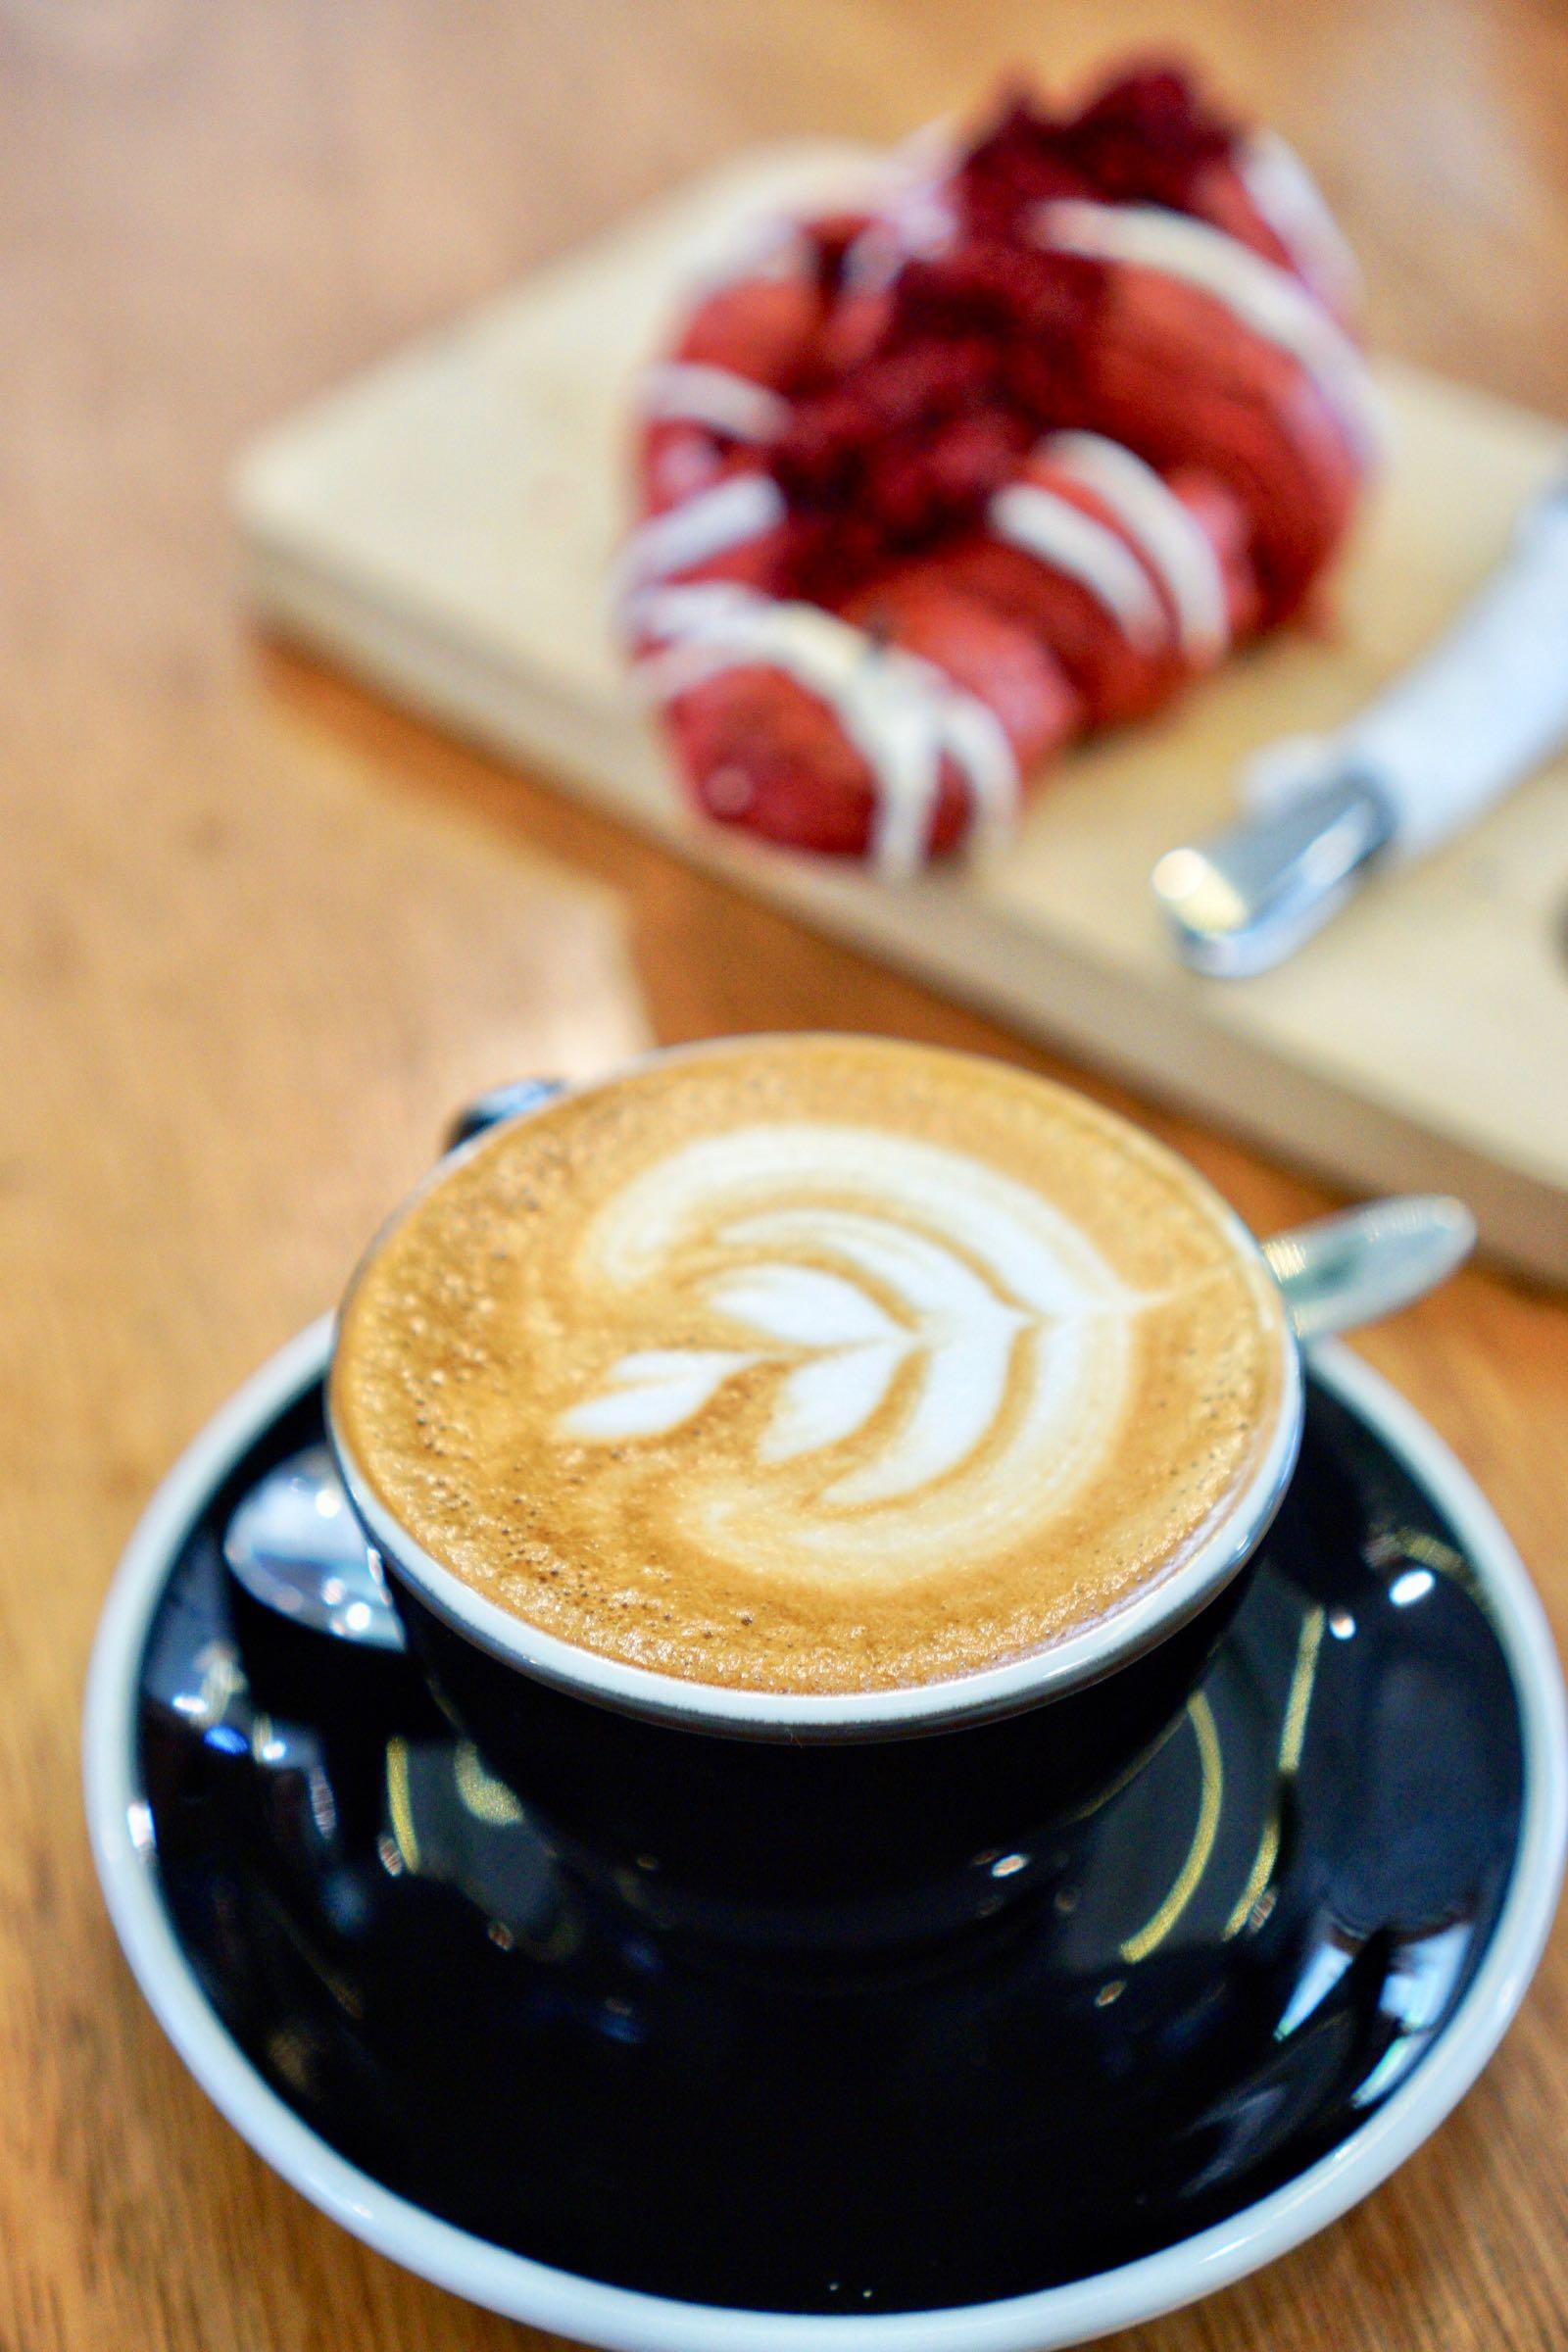 Aditi Bandung Coffee and Croissant